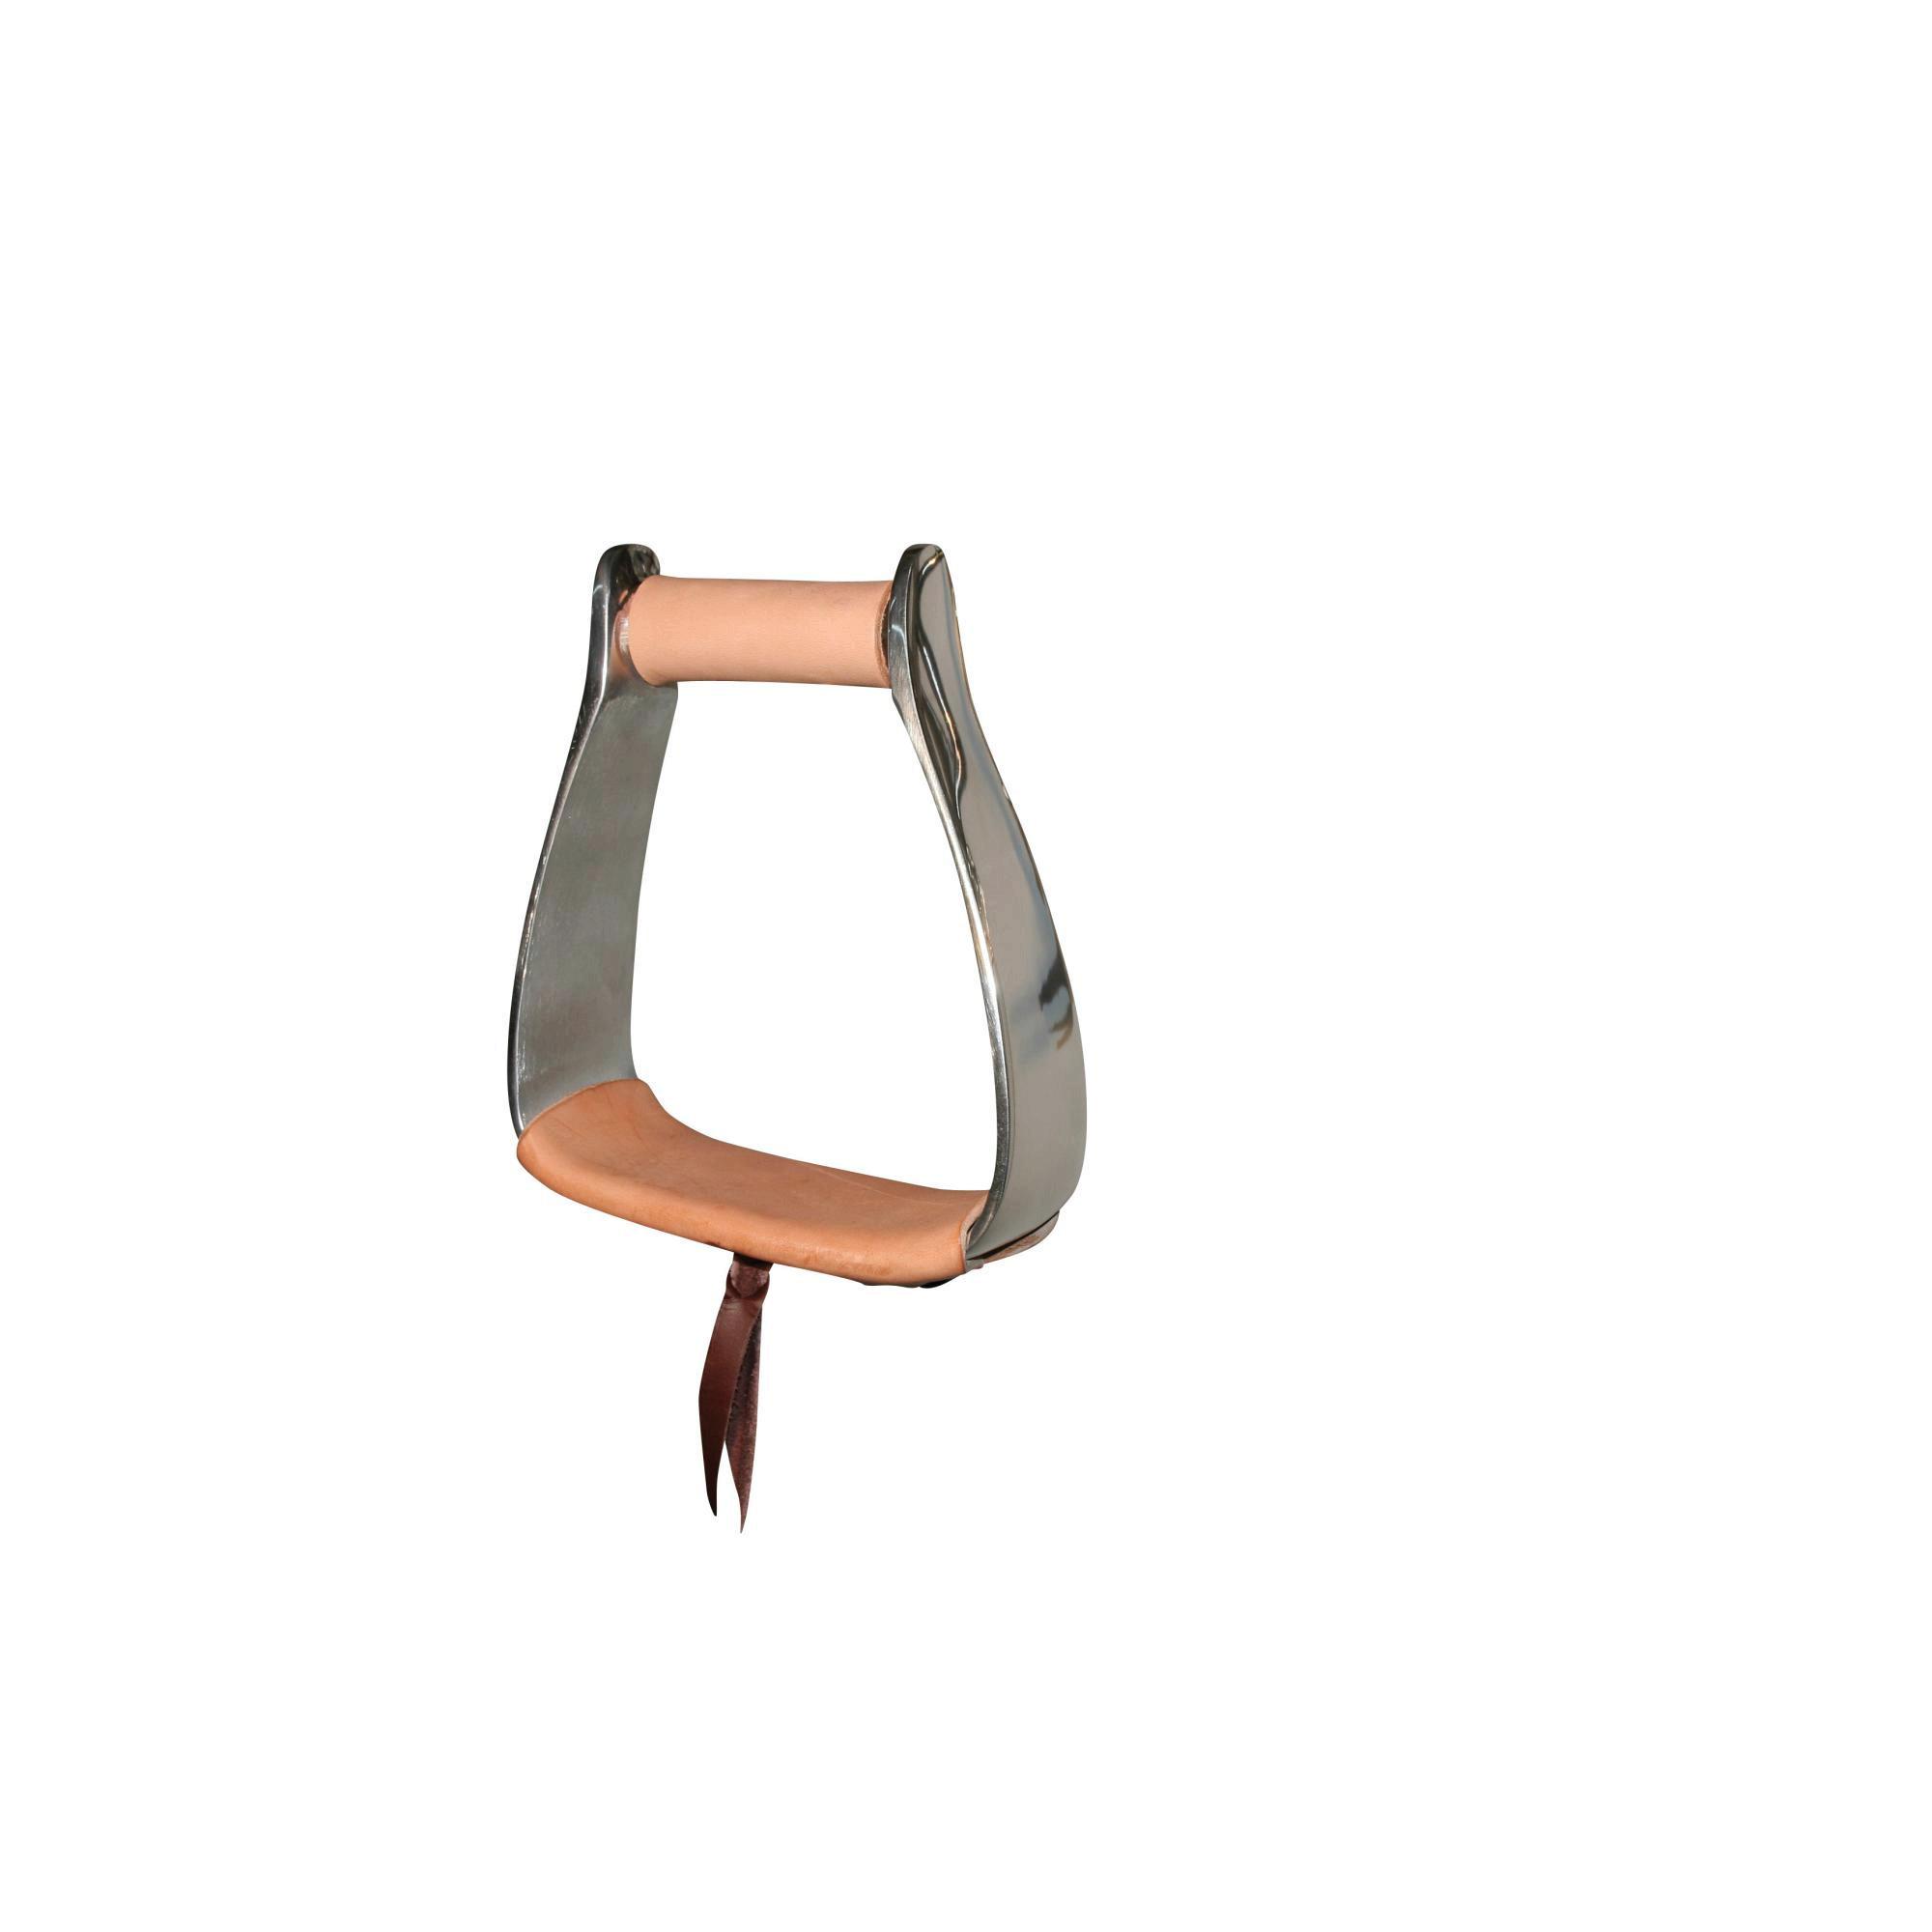 Reinsman Aluminum Slanted Roper Stirrup